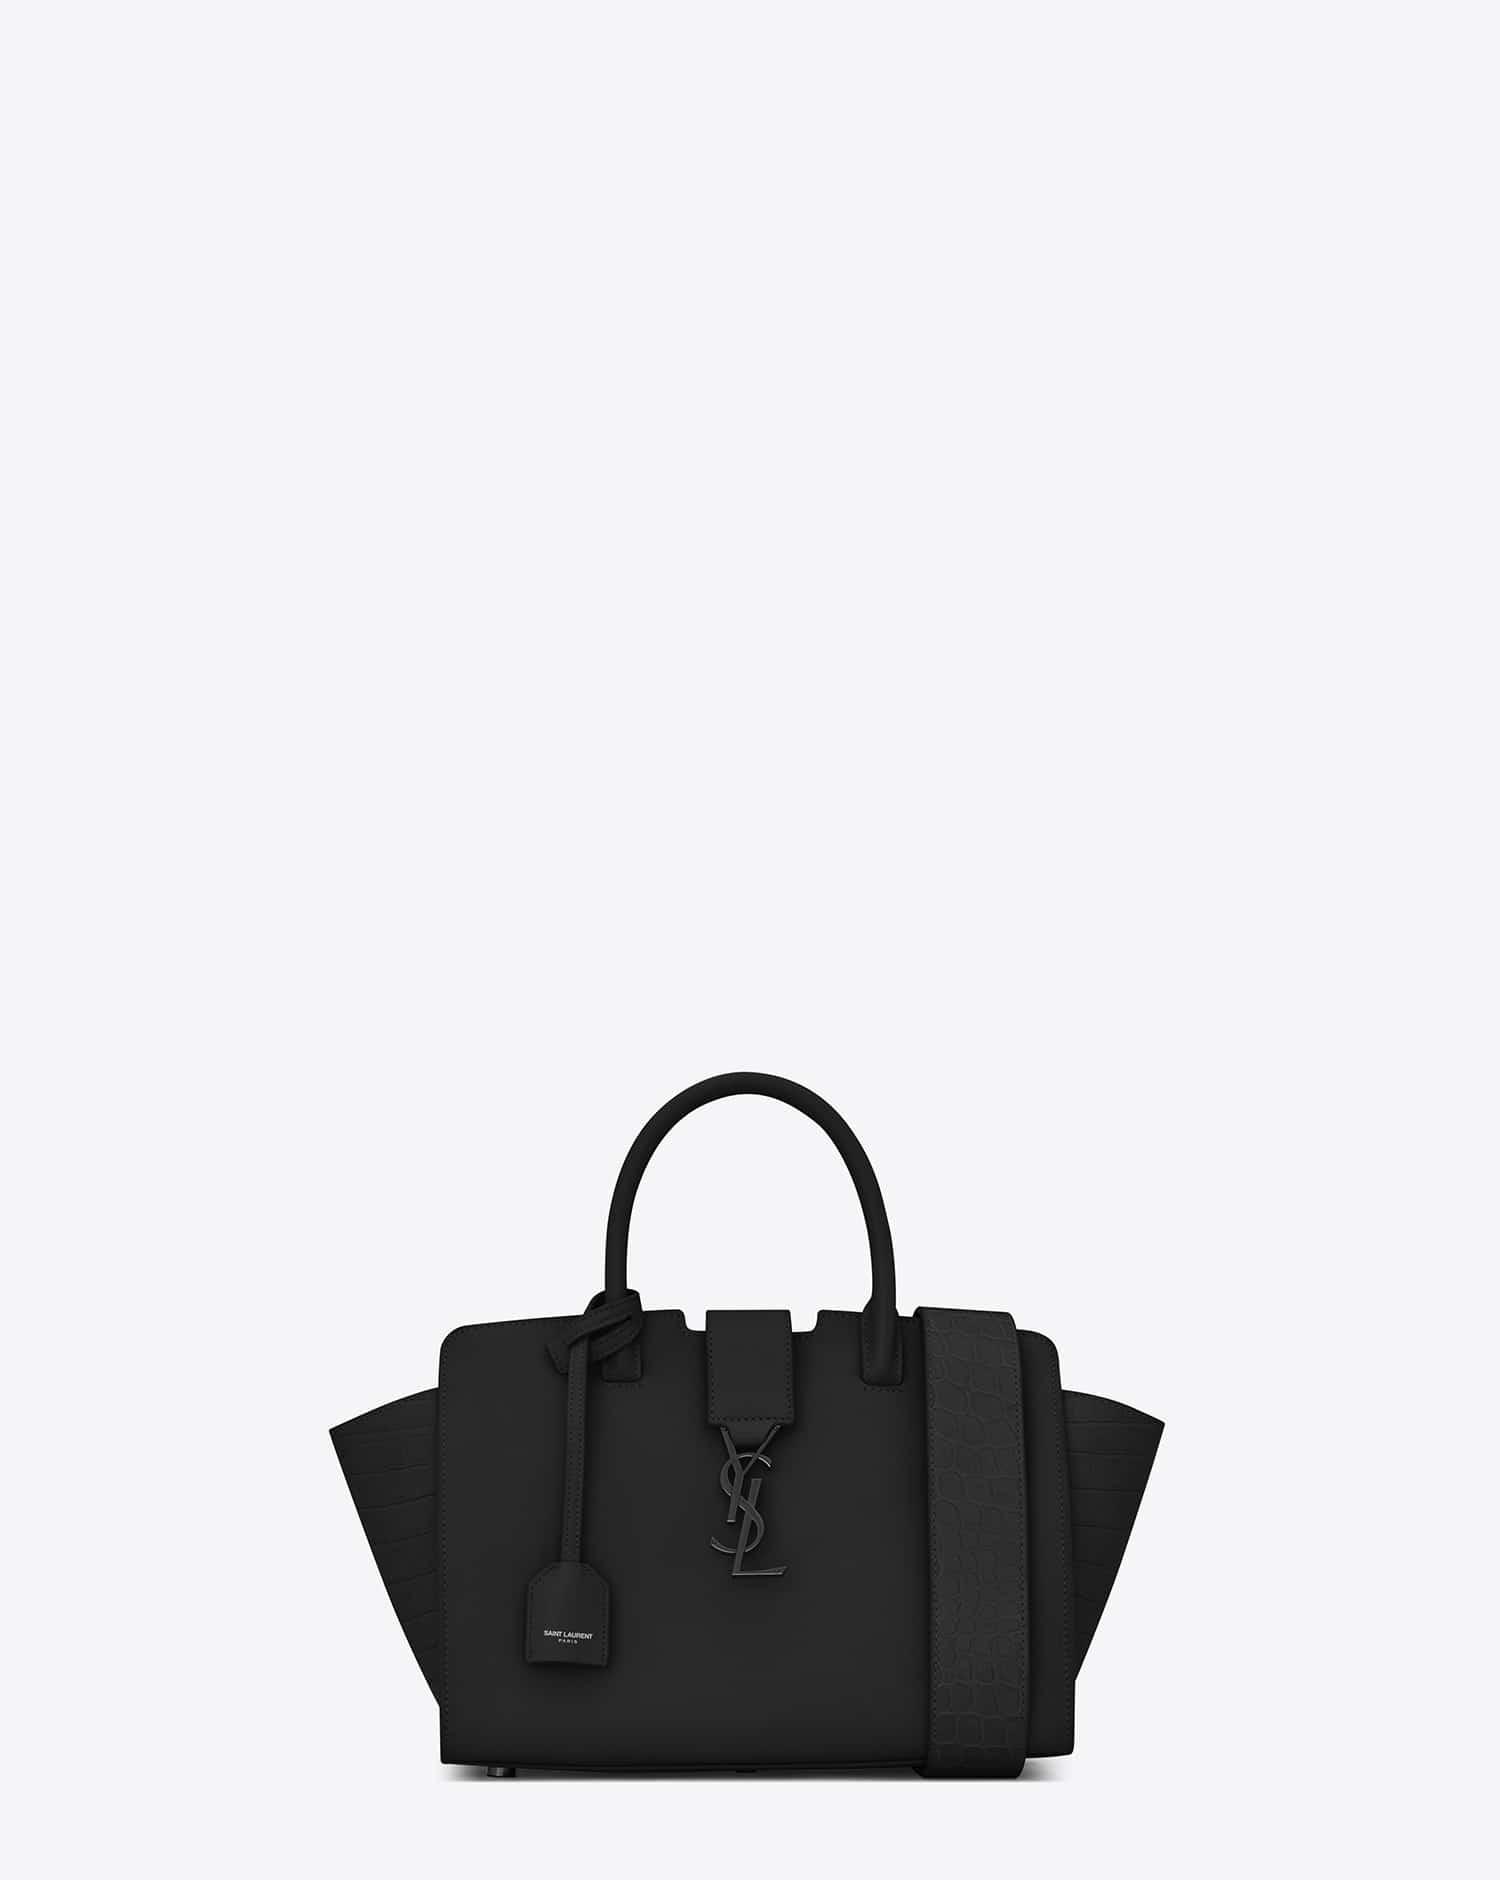 Saint Laurent Spring Summer 2017 Bag Collection Spotted